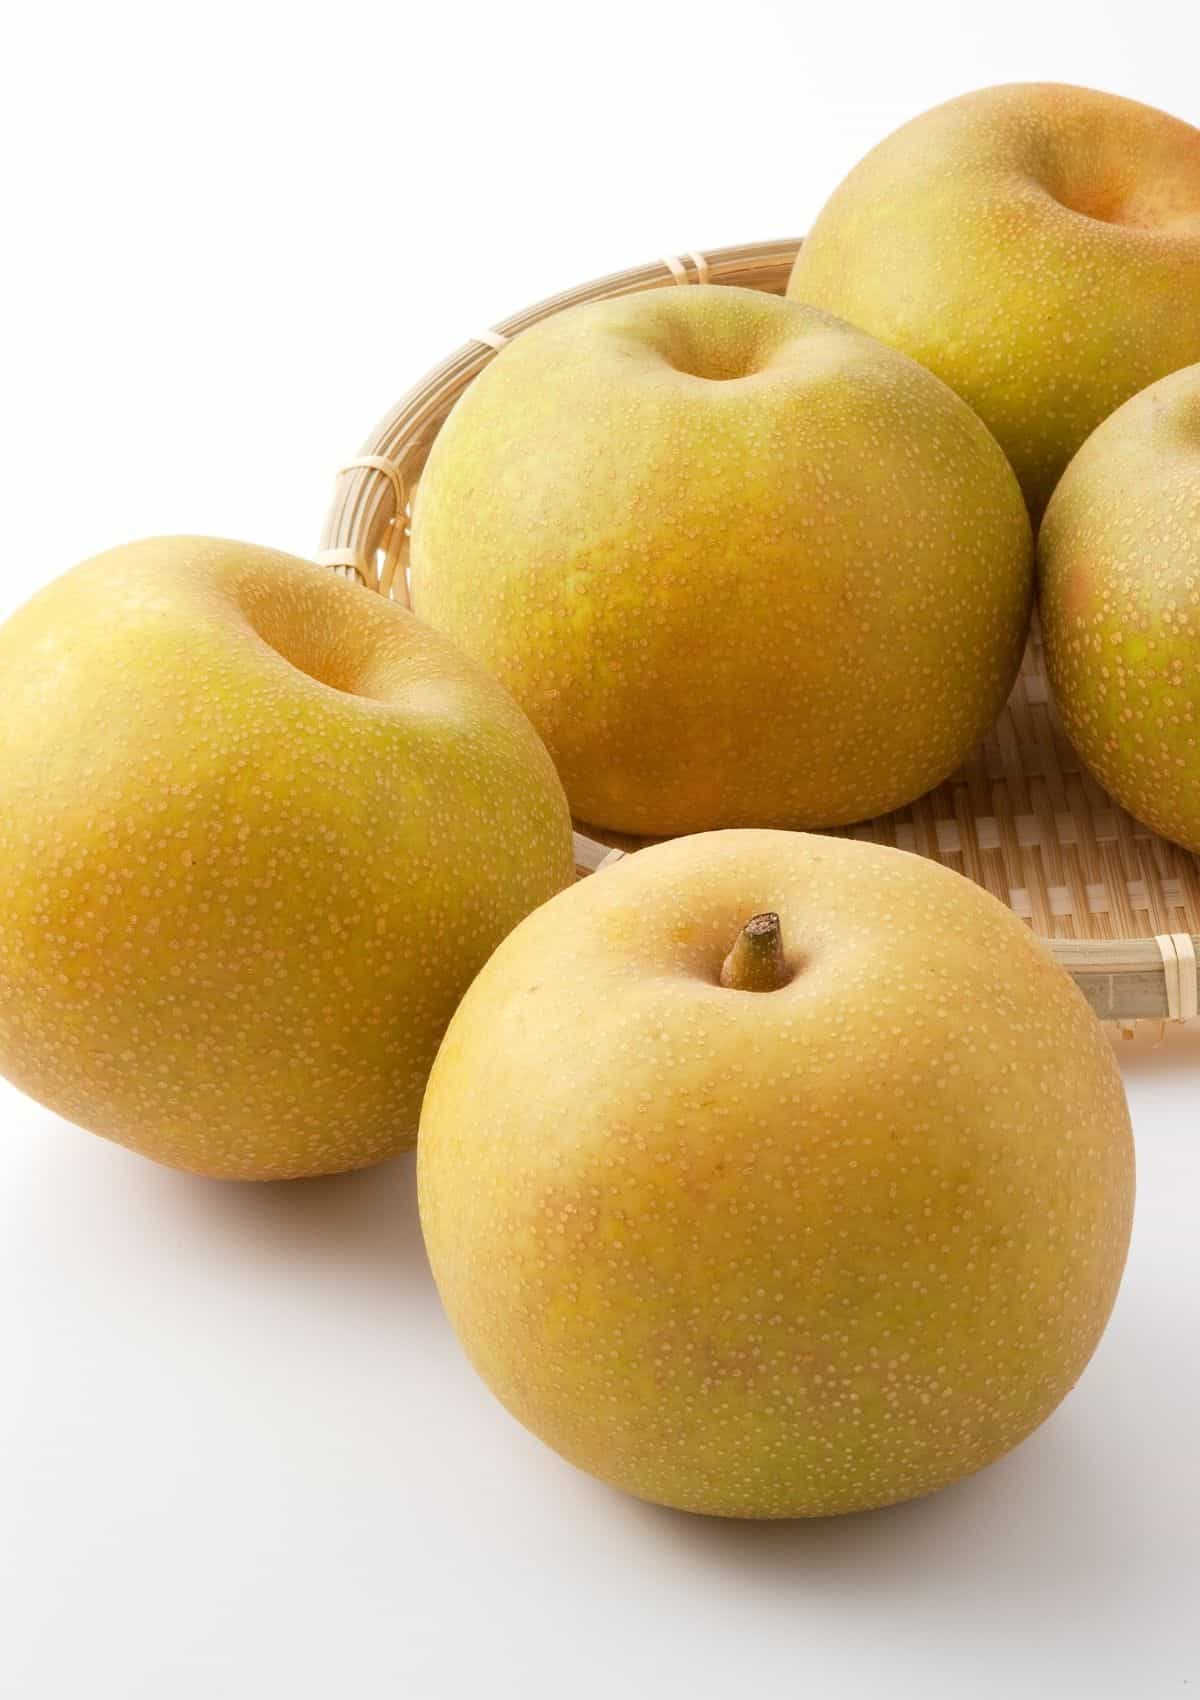 Nashi pears in basket.